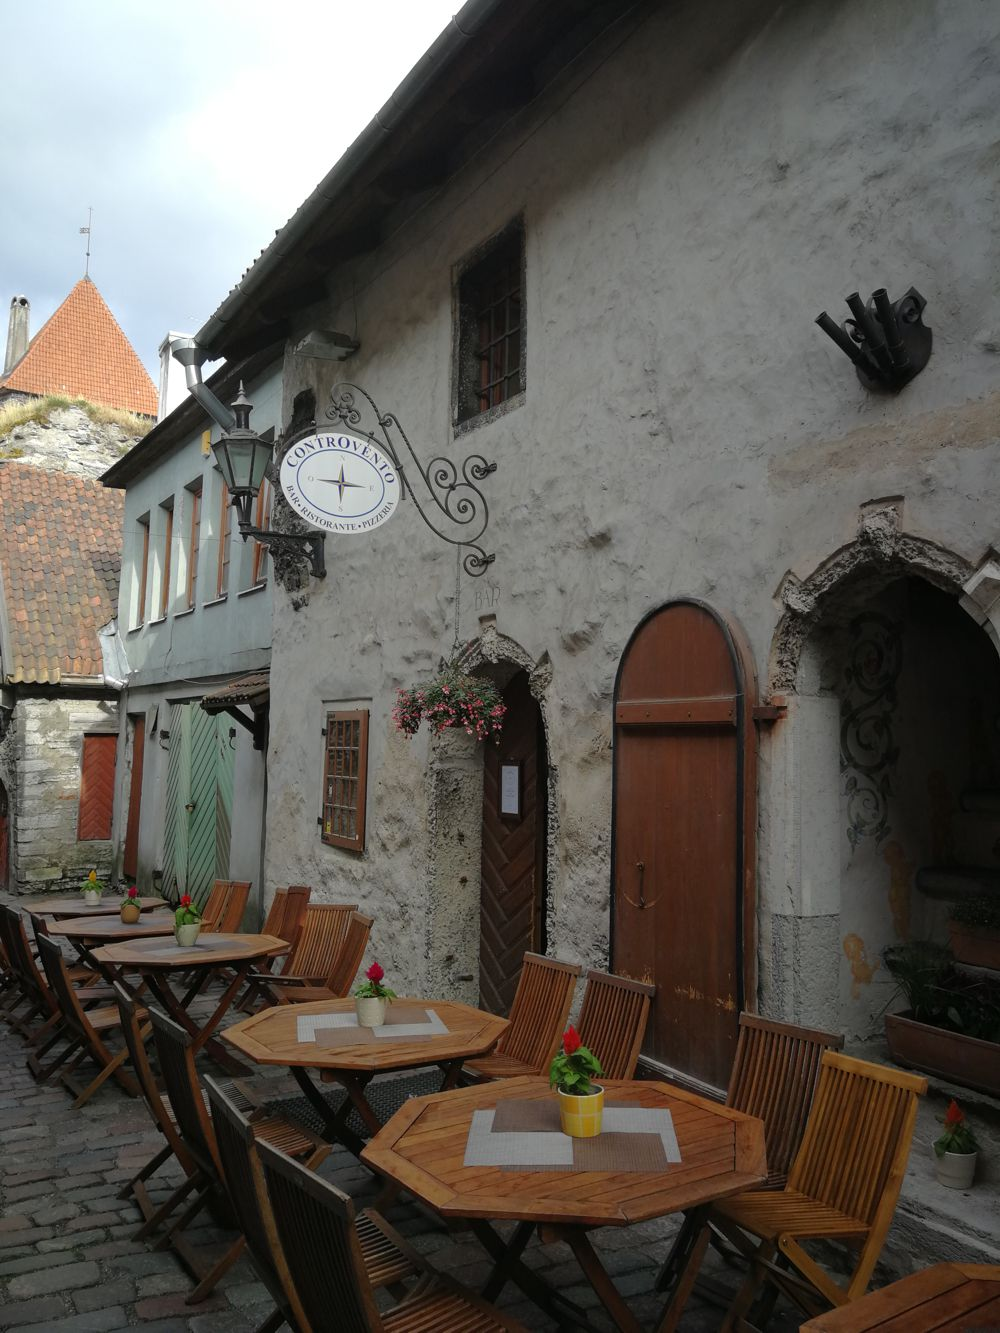 Restoranas Estijoje Motyvacineskeliones.lt